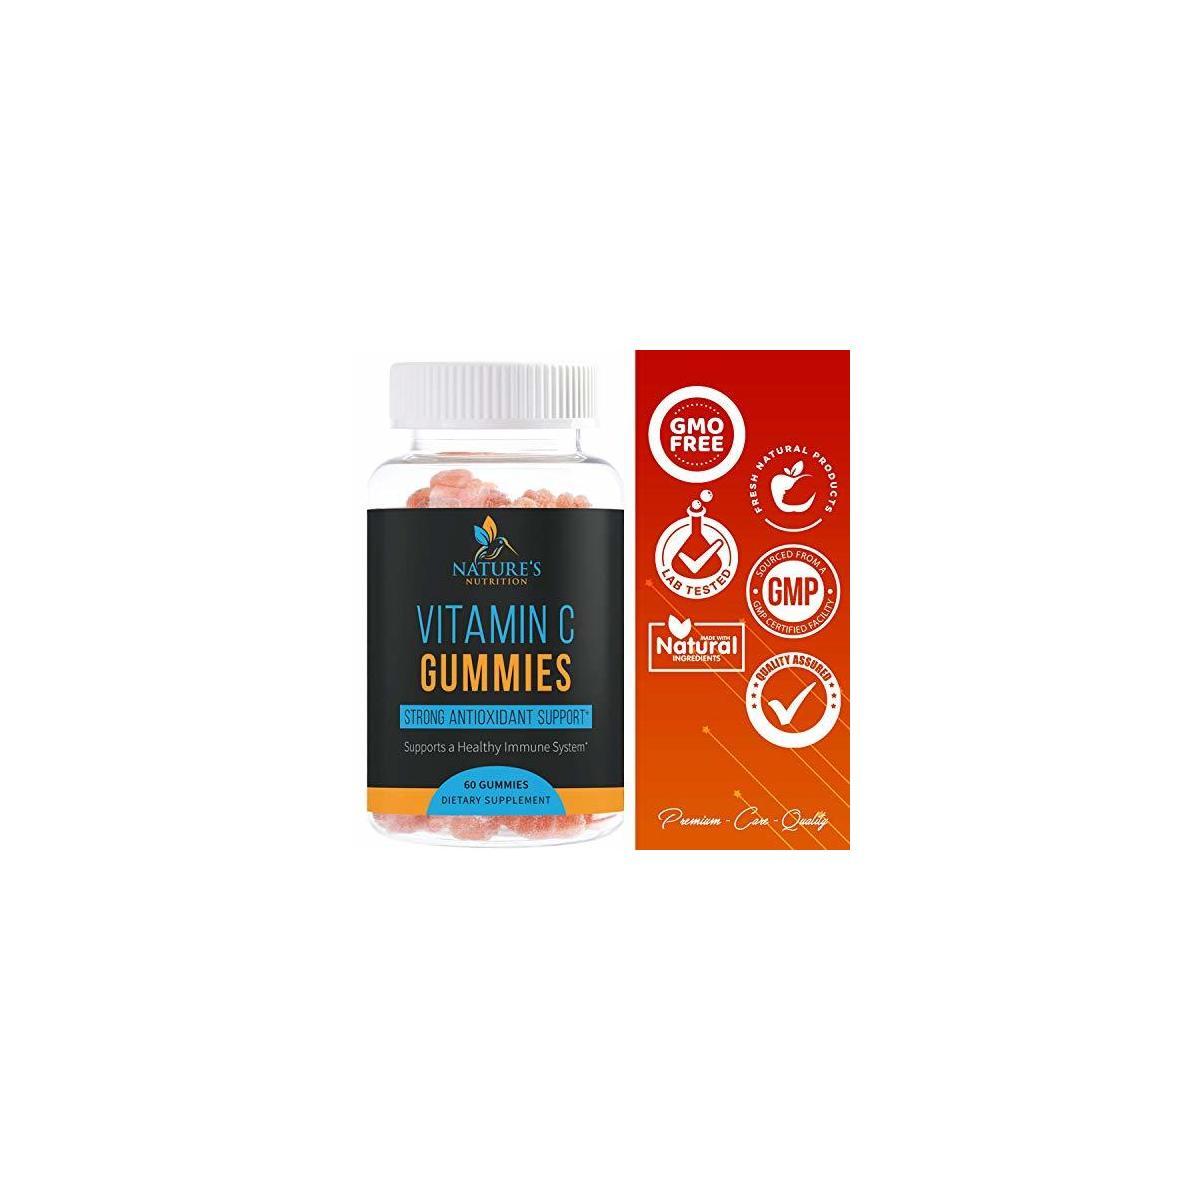 Vitamin C Gummies High Potency Immune Gummy - Chewable Immune System Support & Antioxidant Formula - Best Vegan Natural Health Support for Men, Women and Kids - 60 Gummies